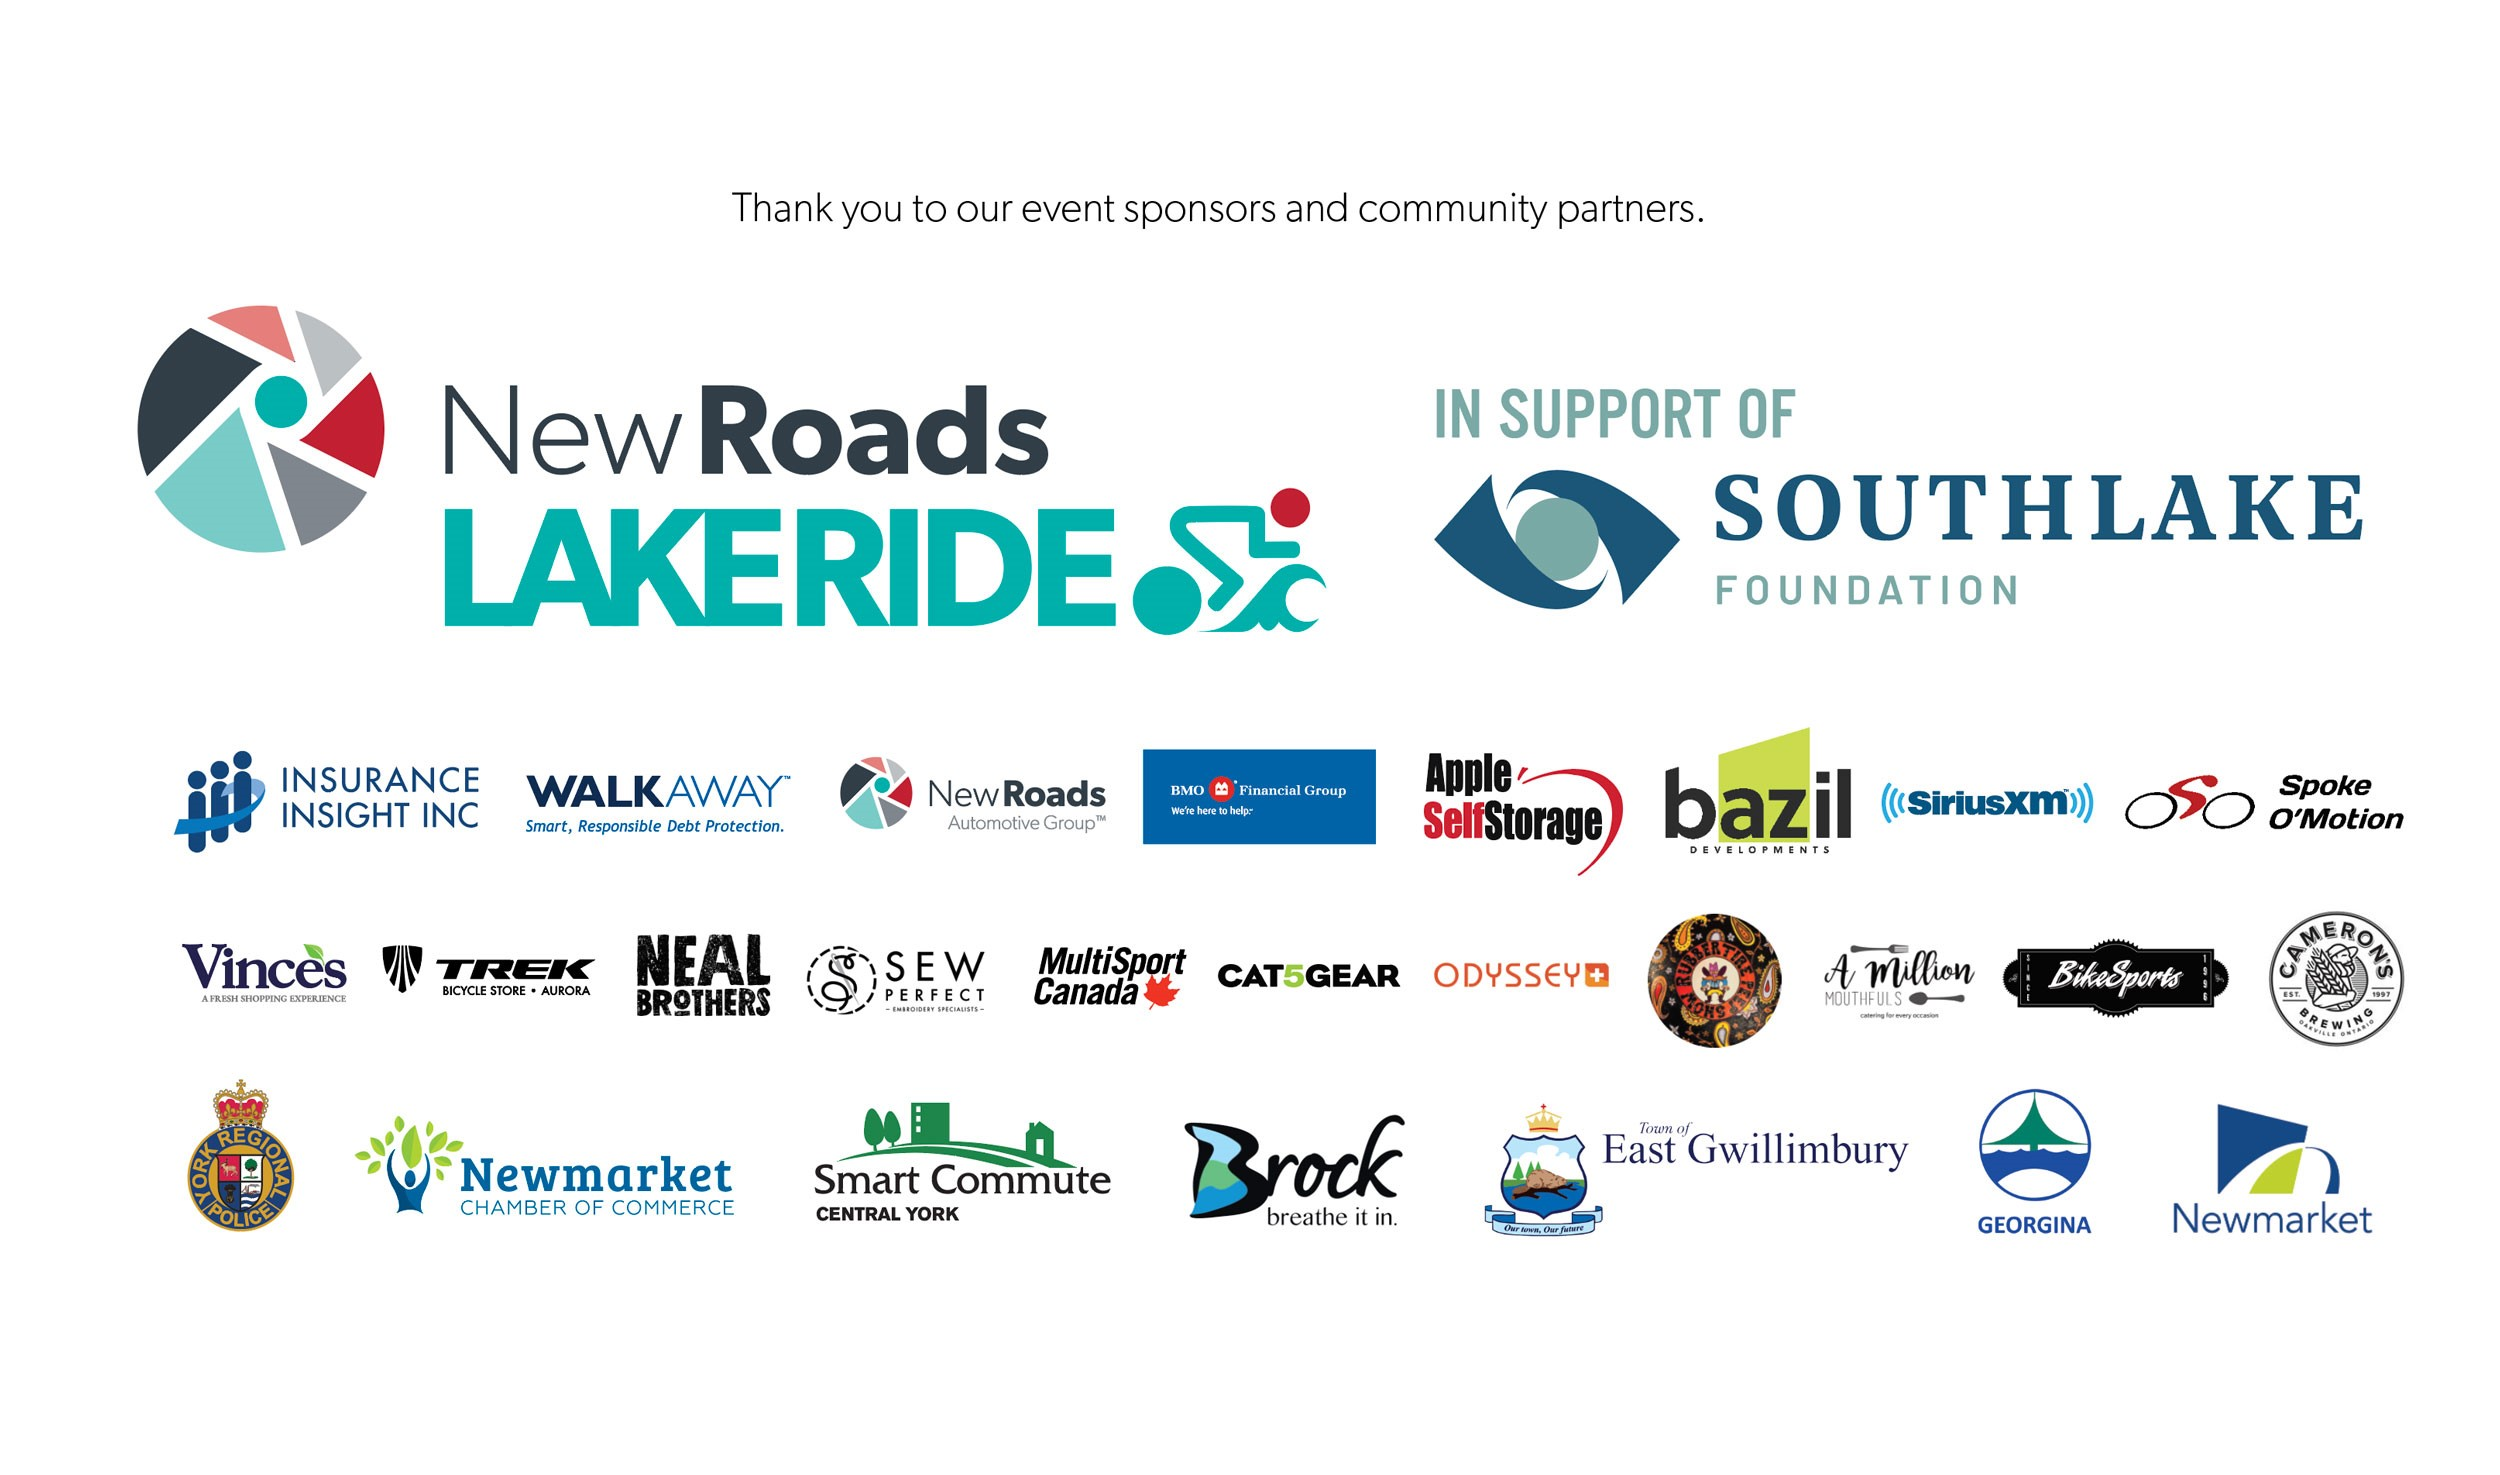 NewRoads LakeRide Sponsors